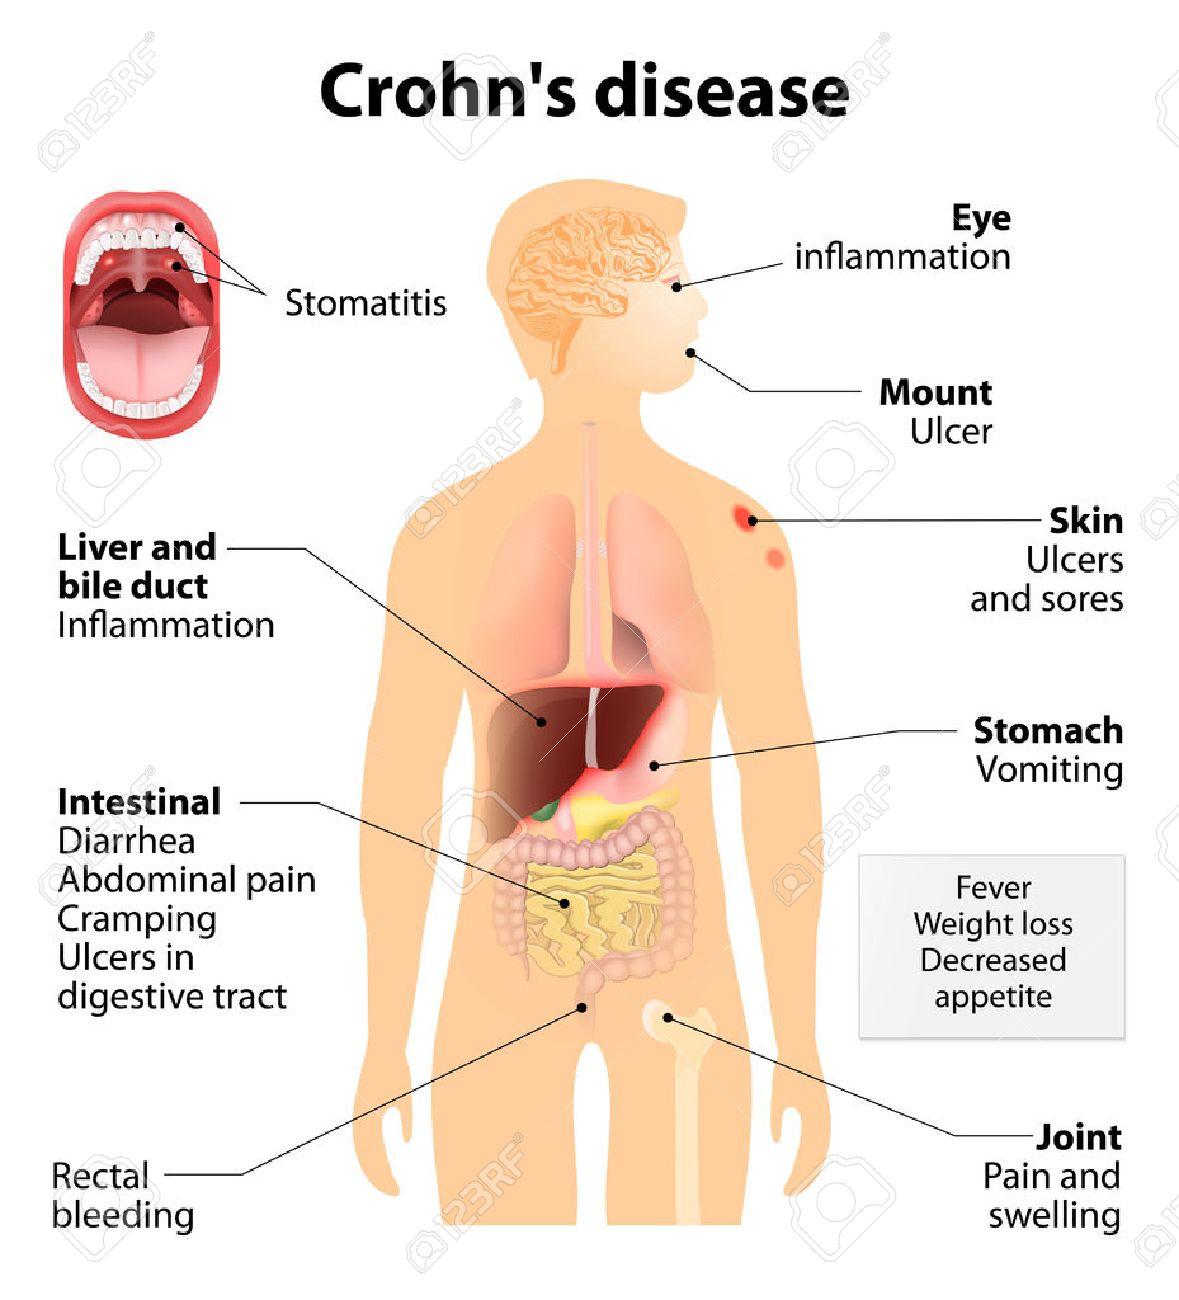 Disease clipart crohn's disease, Disease crohn's disease Transparent FREE  for download on WebStockReview 2020